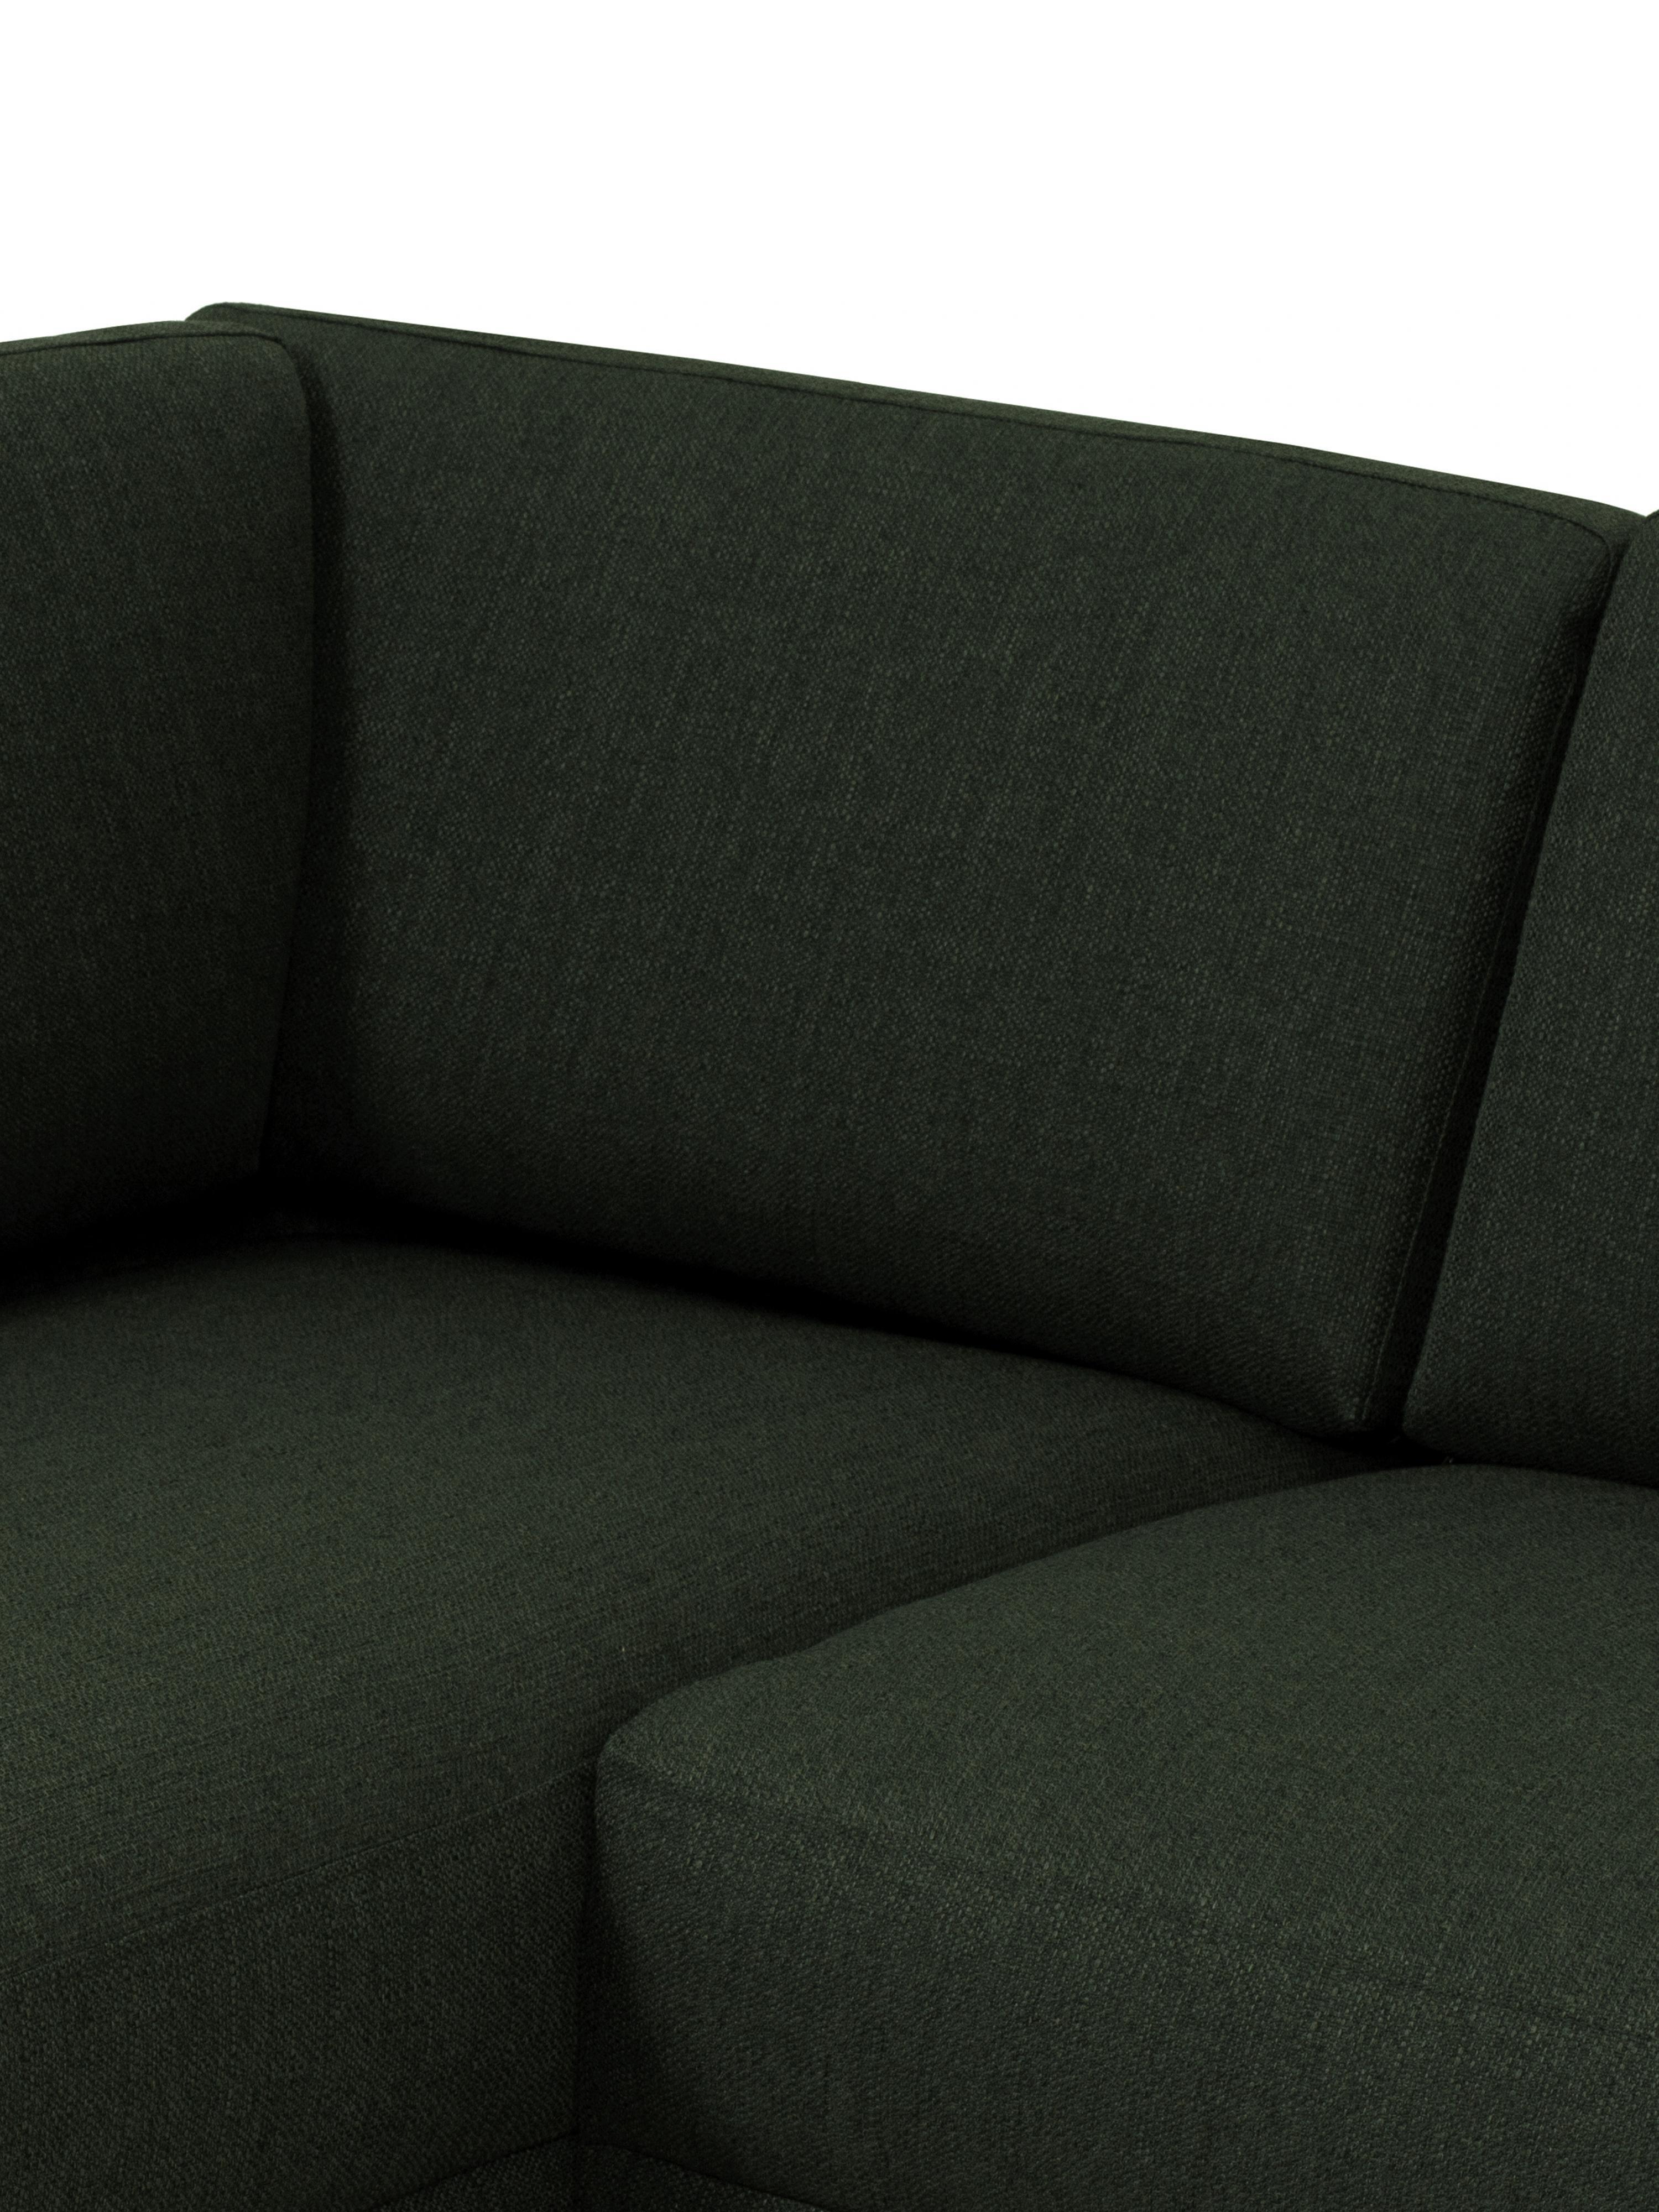 Ecksofa Fluente, Bezug: 100% Polyester Der hochwe, Gestell: Massives Kiefernholz, Füße: Metall, pulverbeschichtet, Webstoff Dunkelgrün, B 221 x T 200 cm